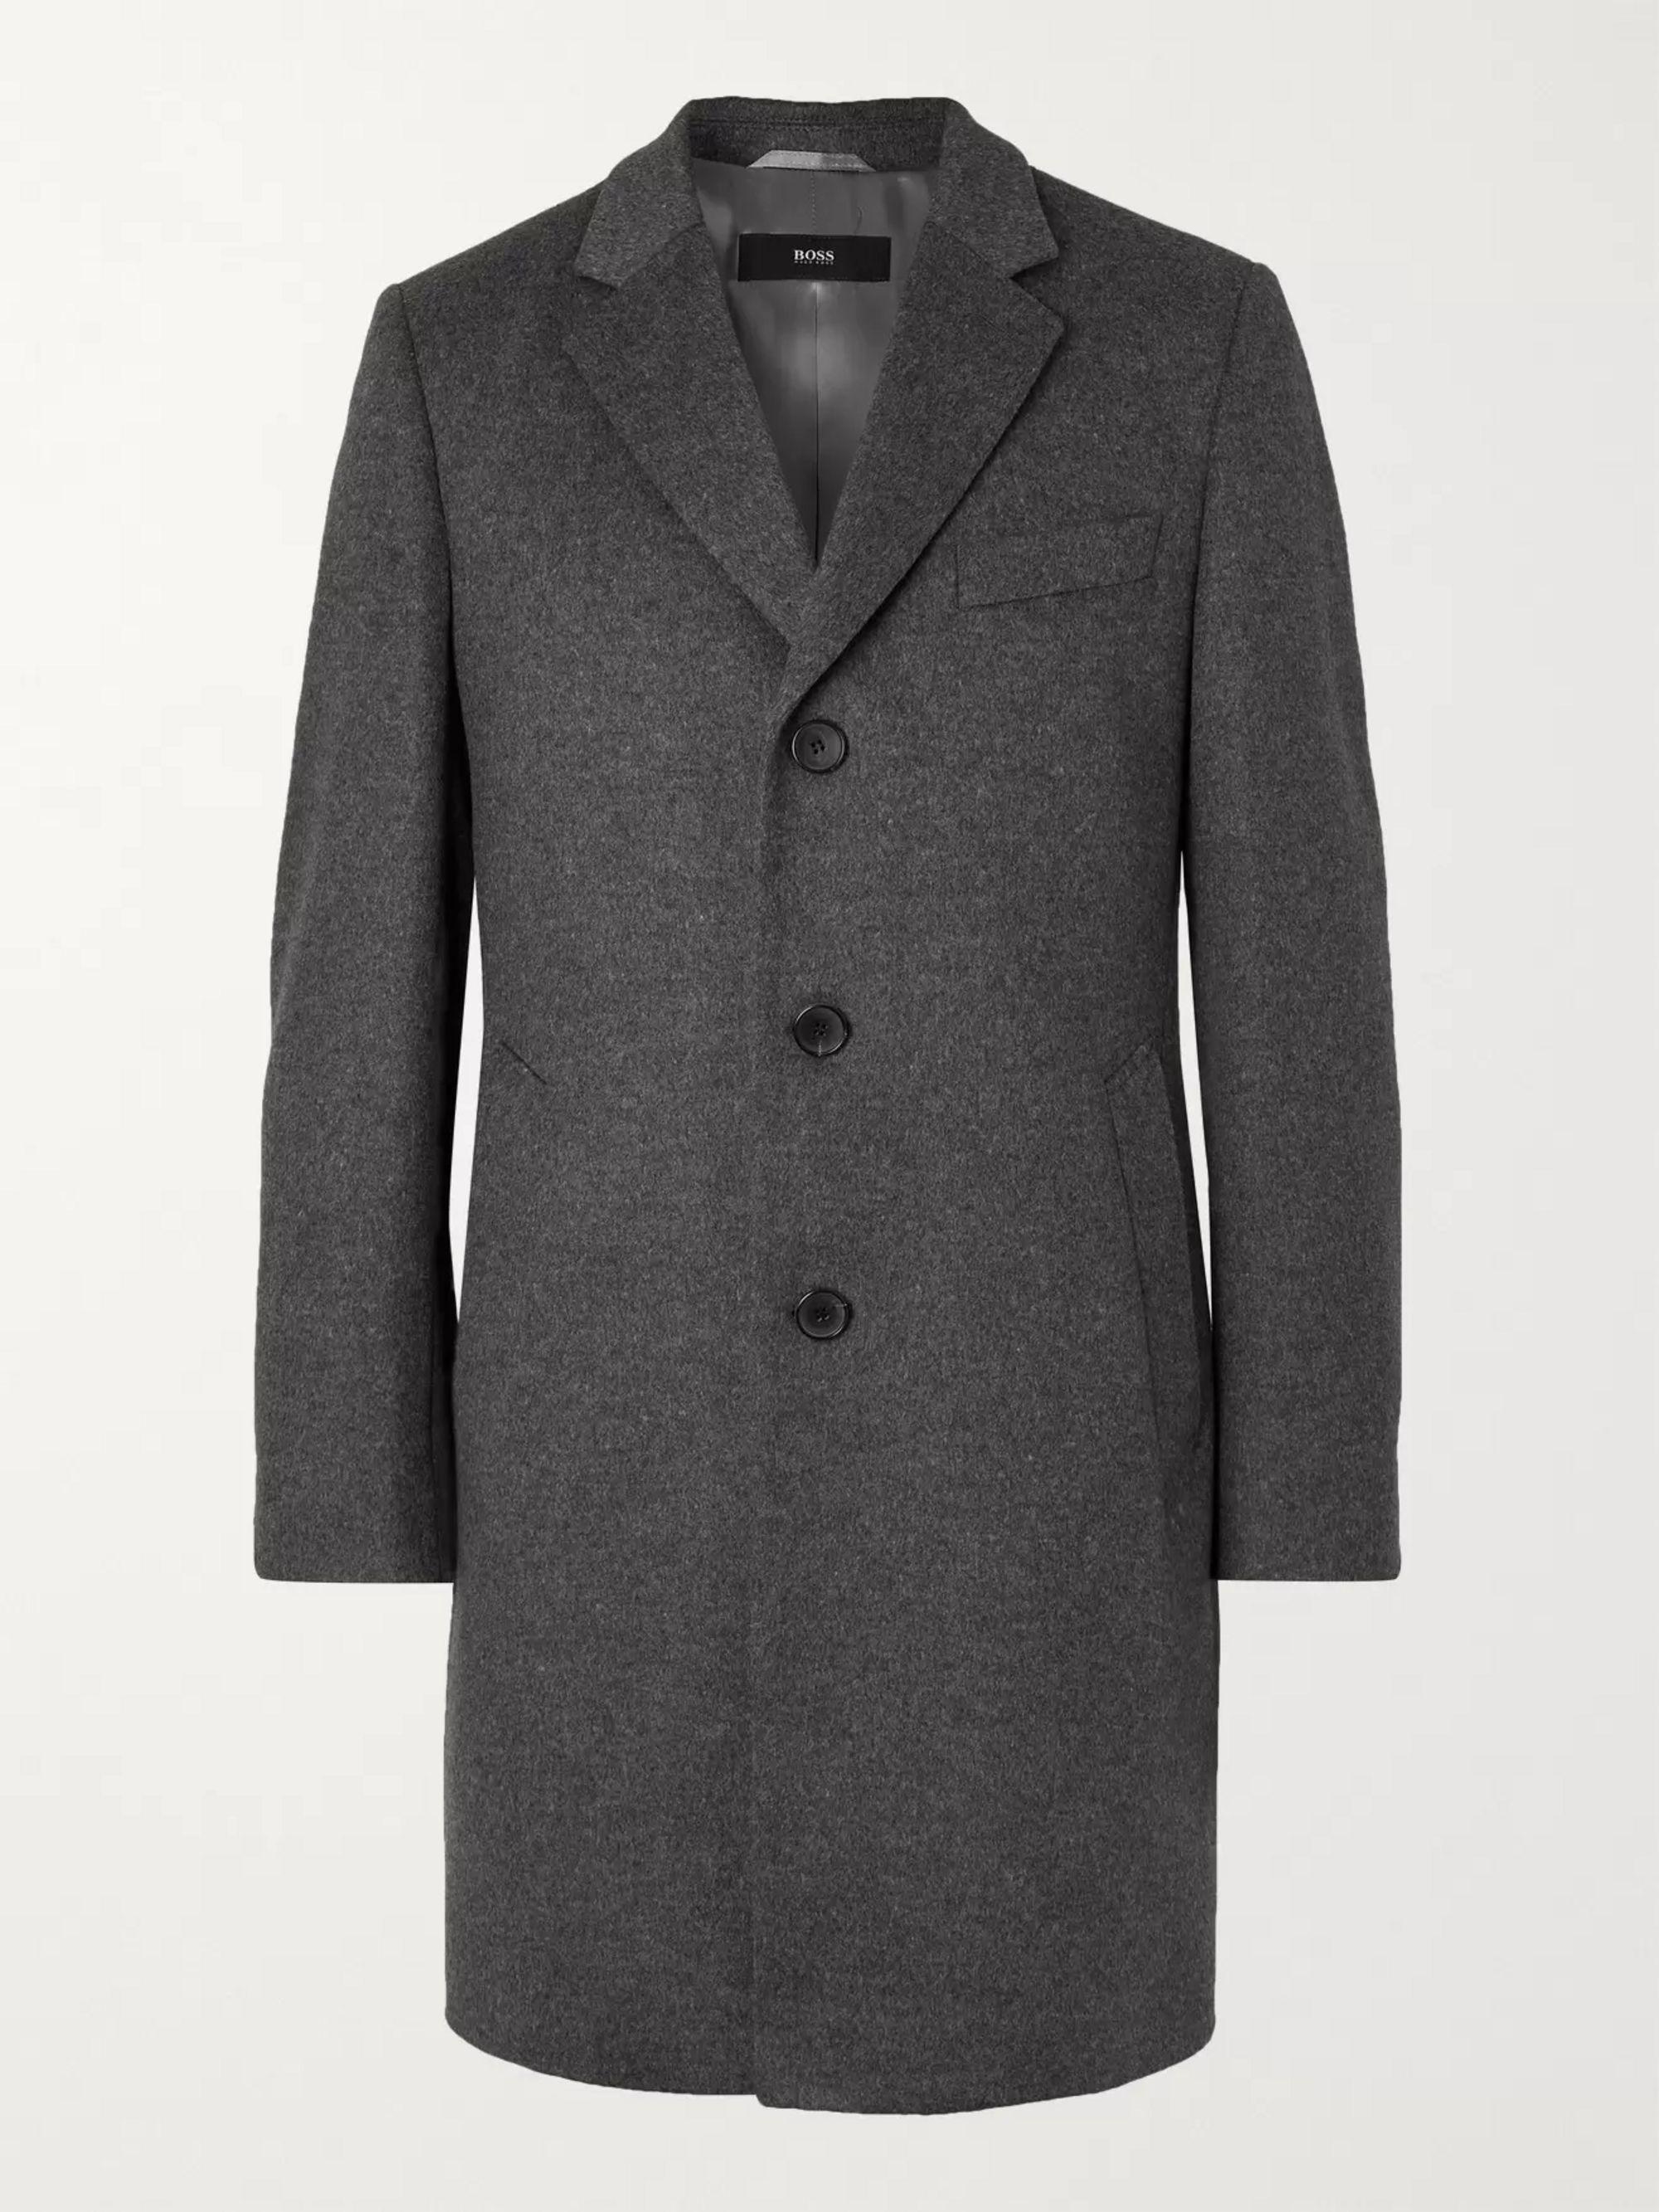 HUGO BOSS Slim-Fit Virgin Wool and Cashmere-Blend Overcoat